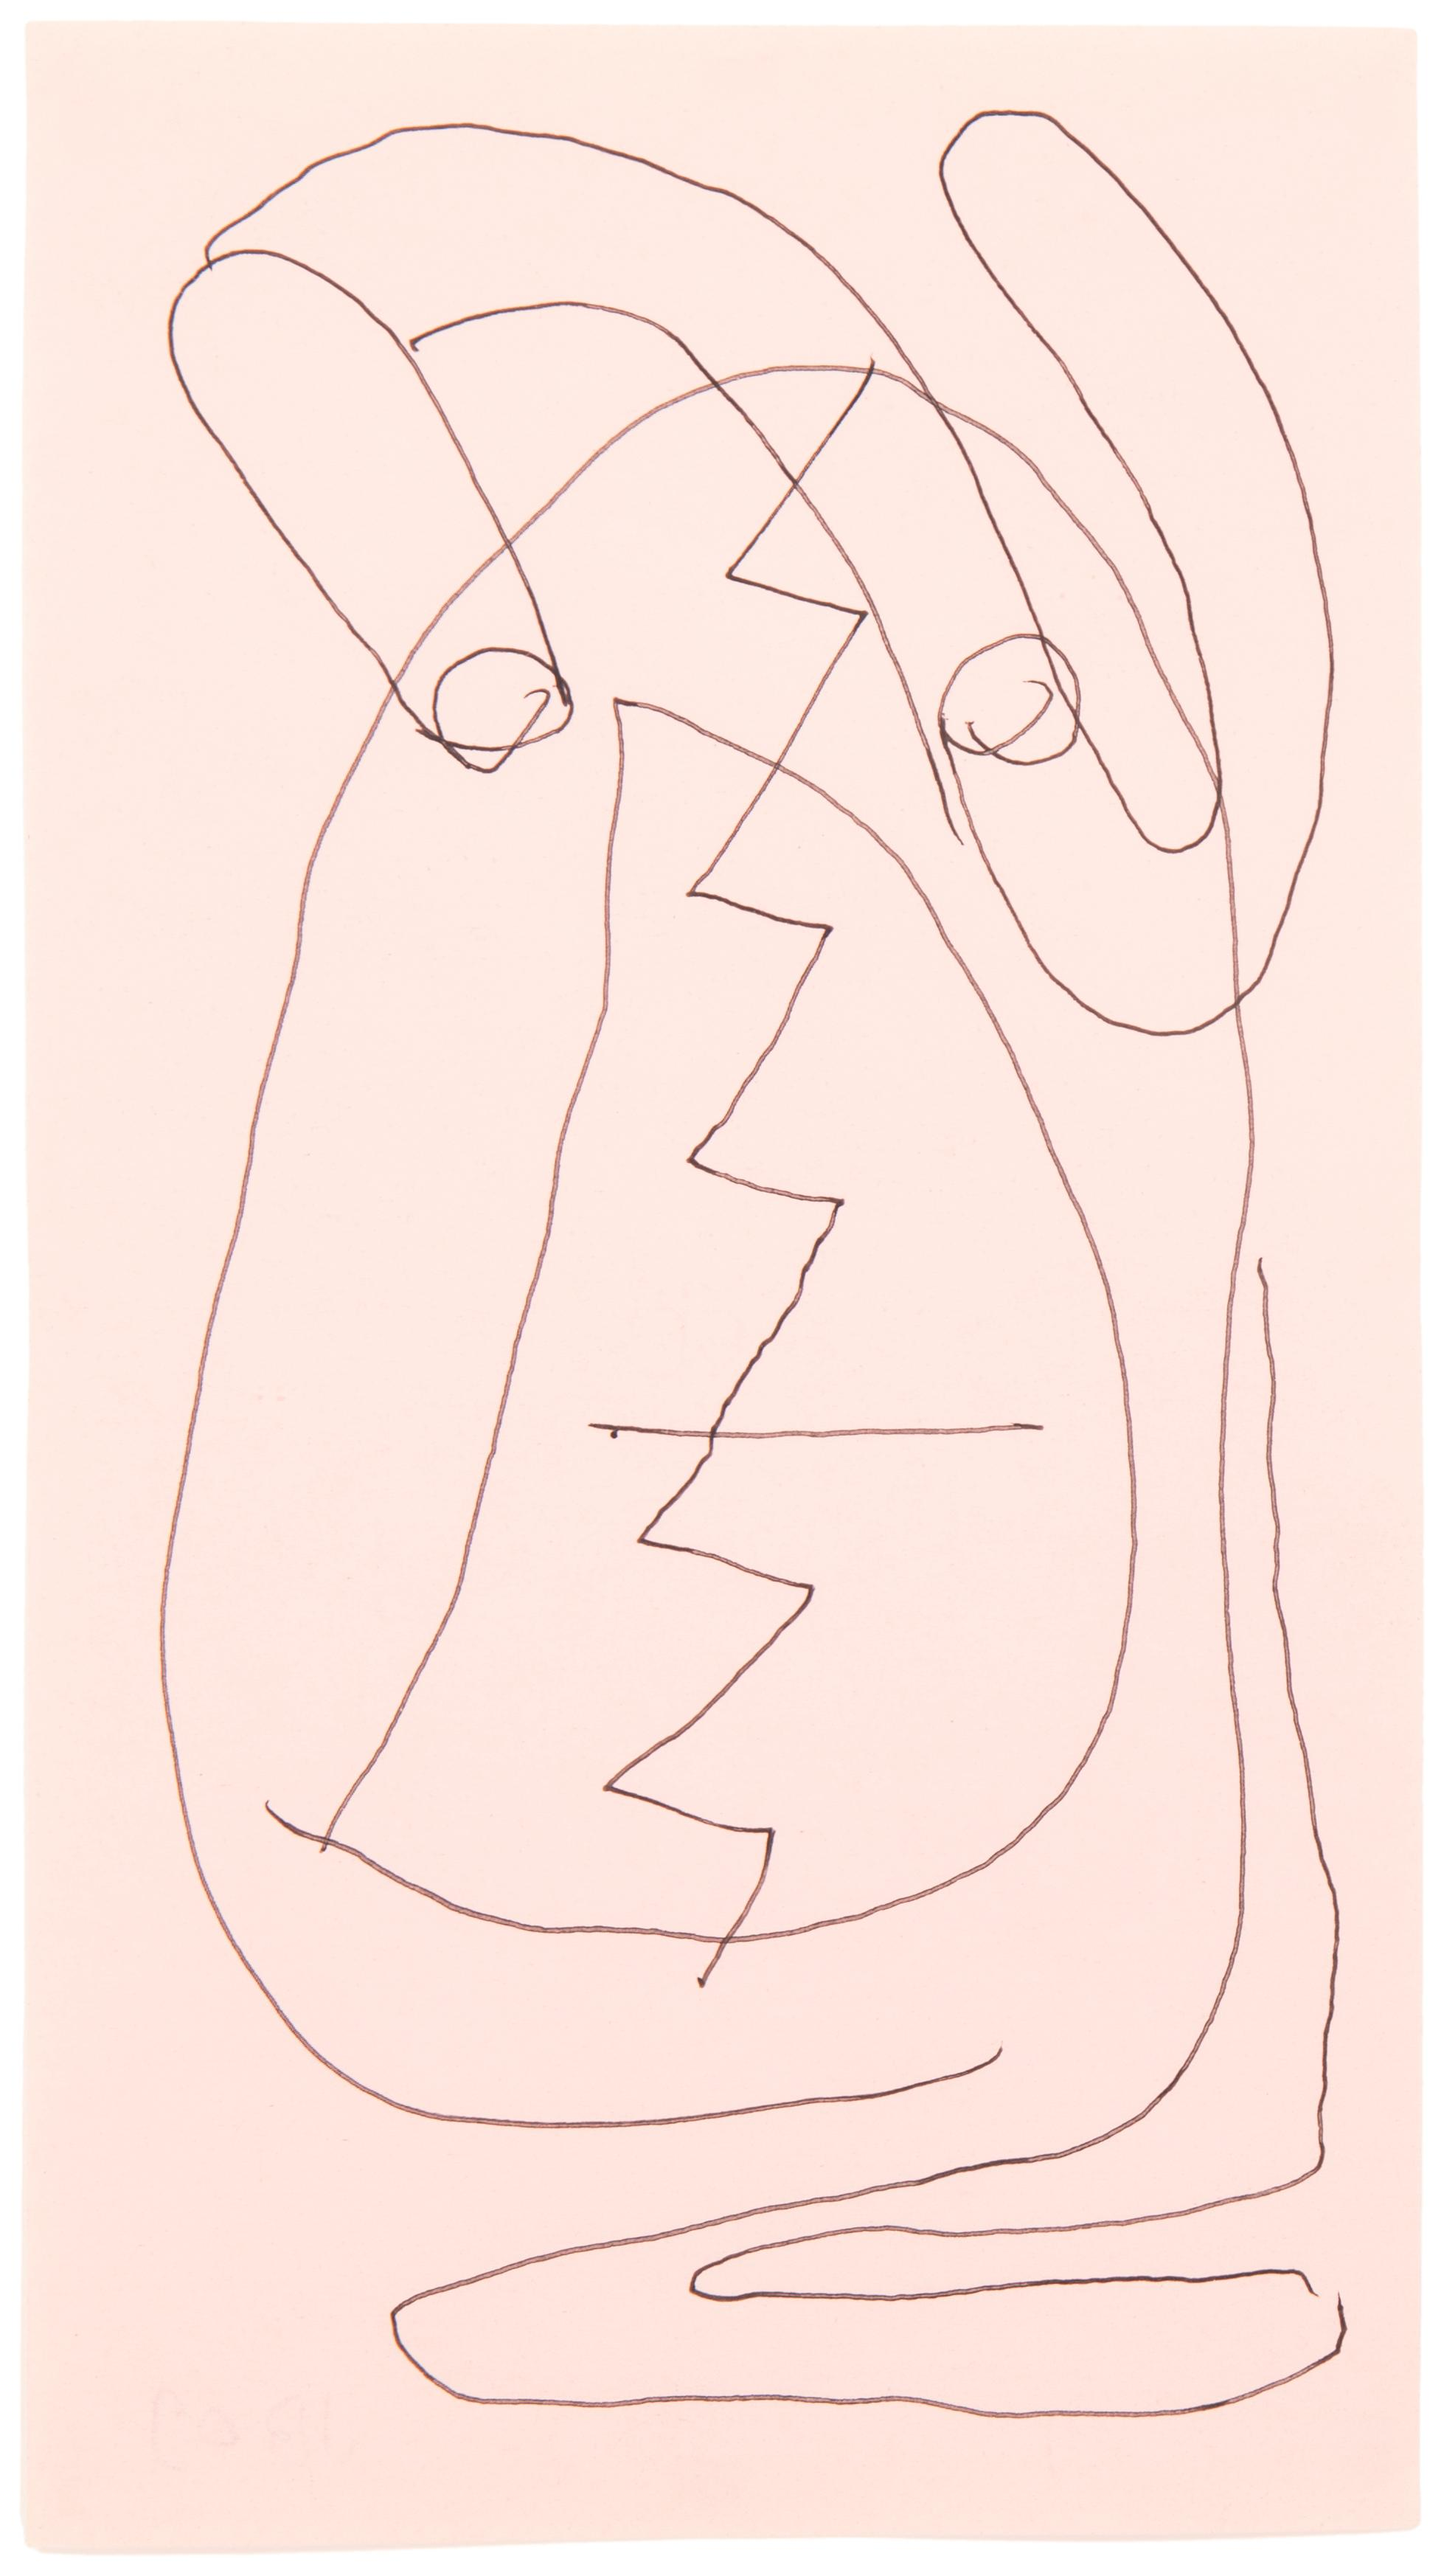 "Joe Bradley, (b. 1975, American), Untitled, 2009, Ink on colored paper under Plexiglas, 8.75"" H x 4.75"" W"